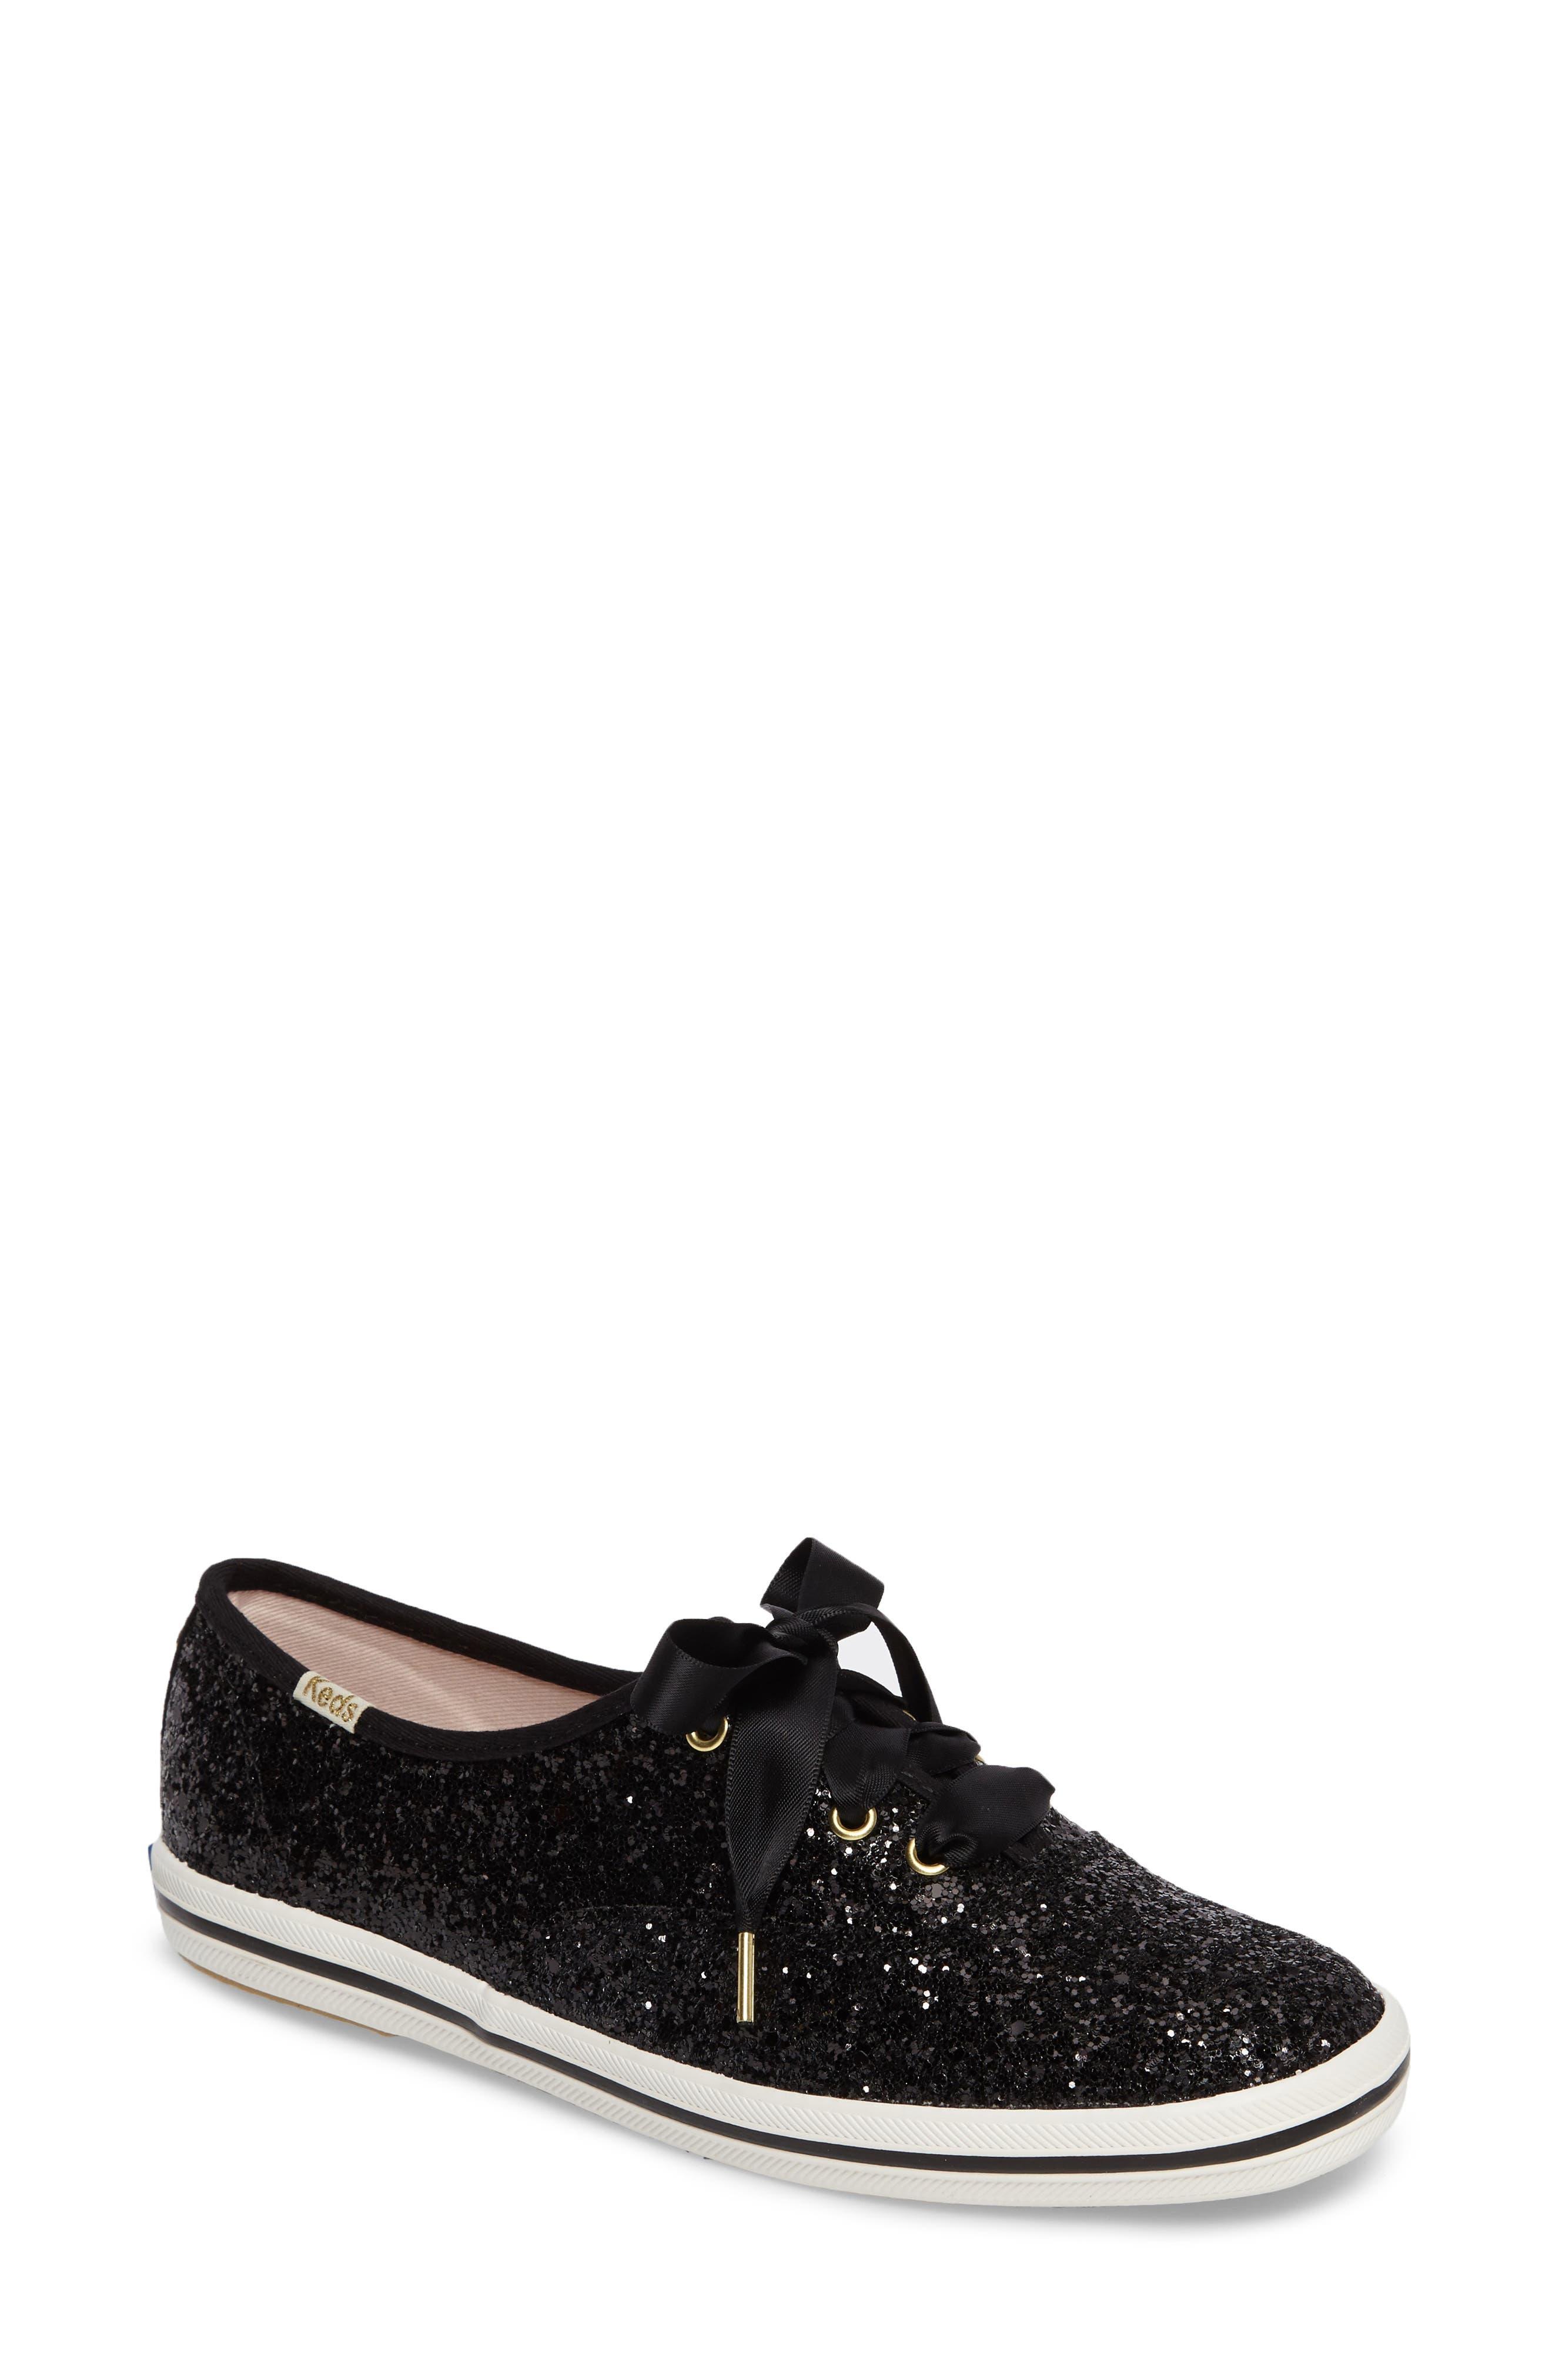 glitter sneaker, Main, color, BLACK